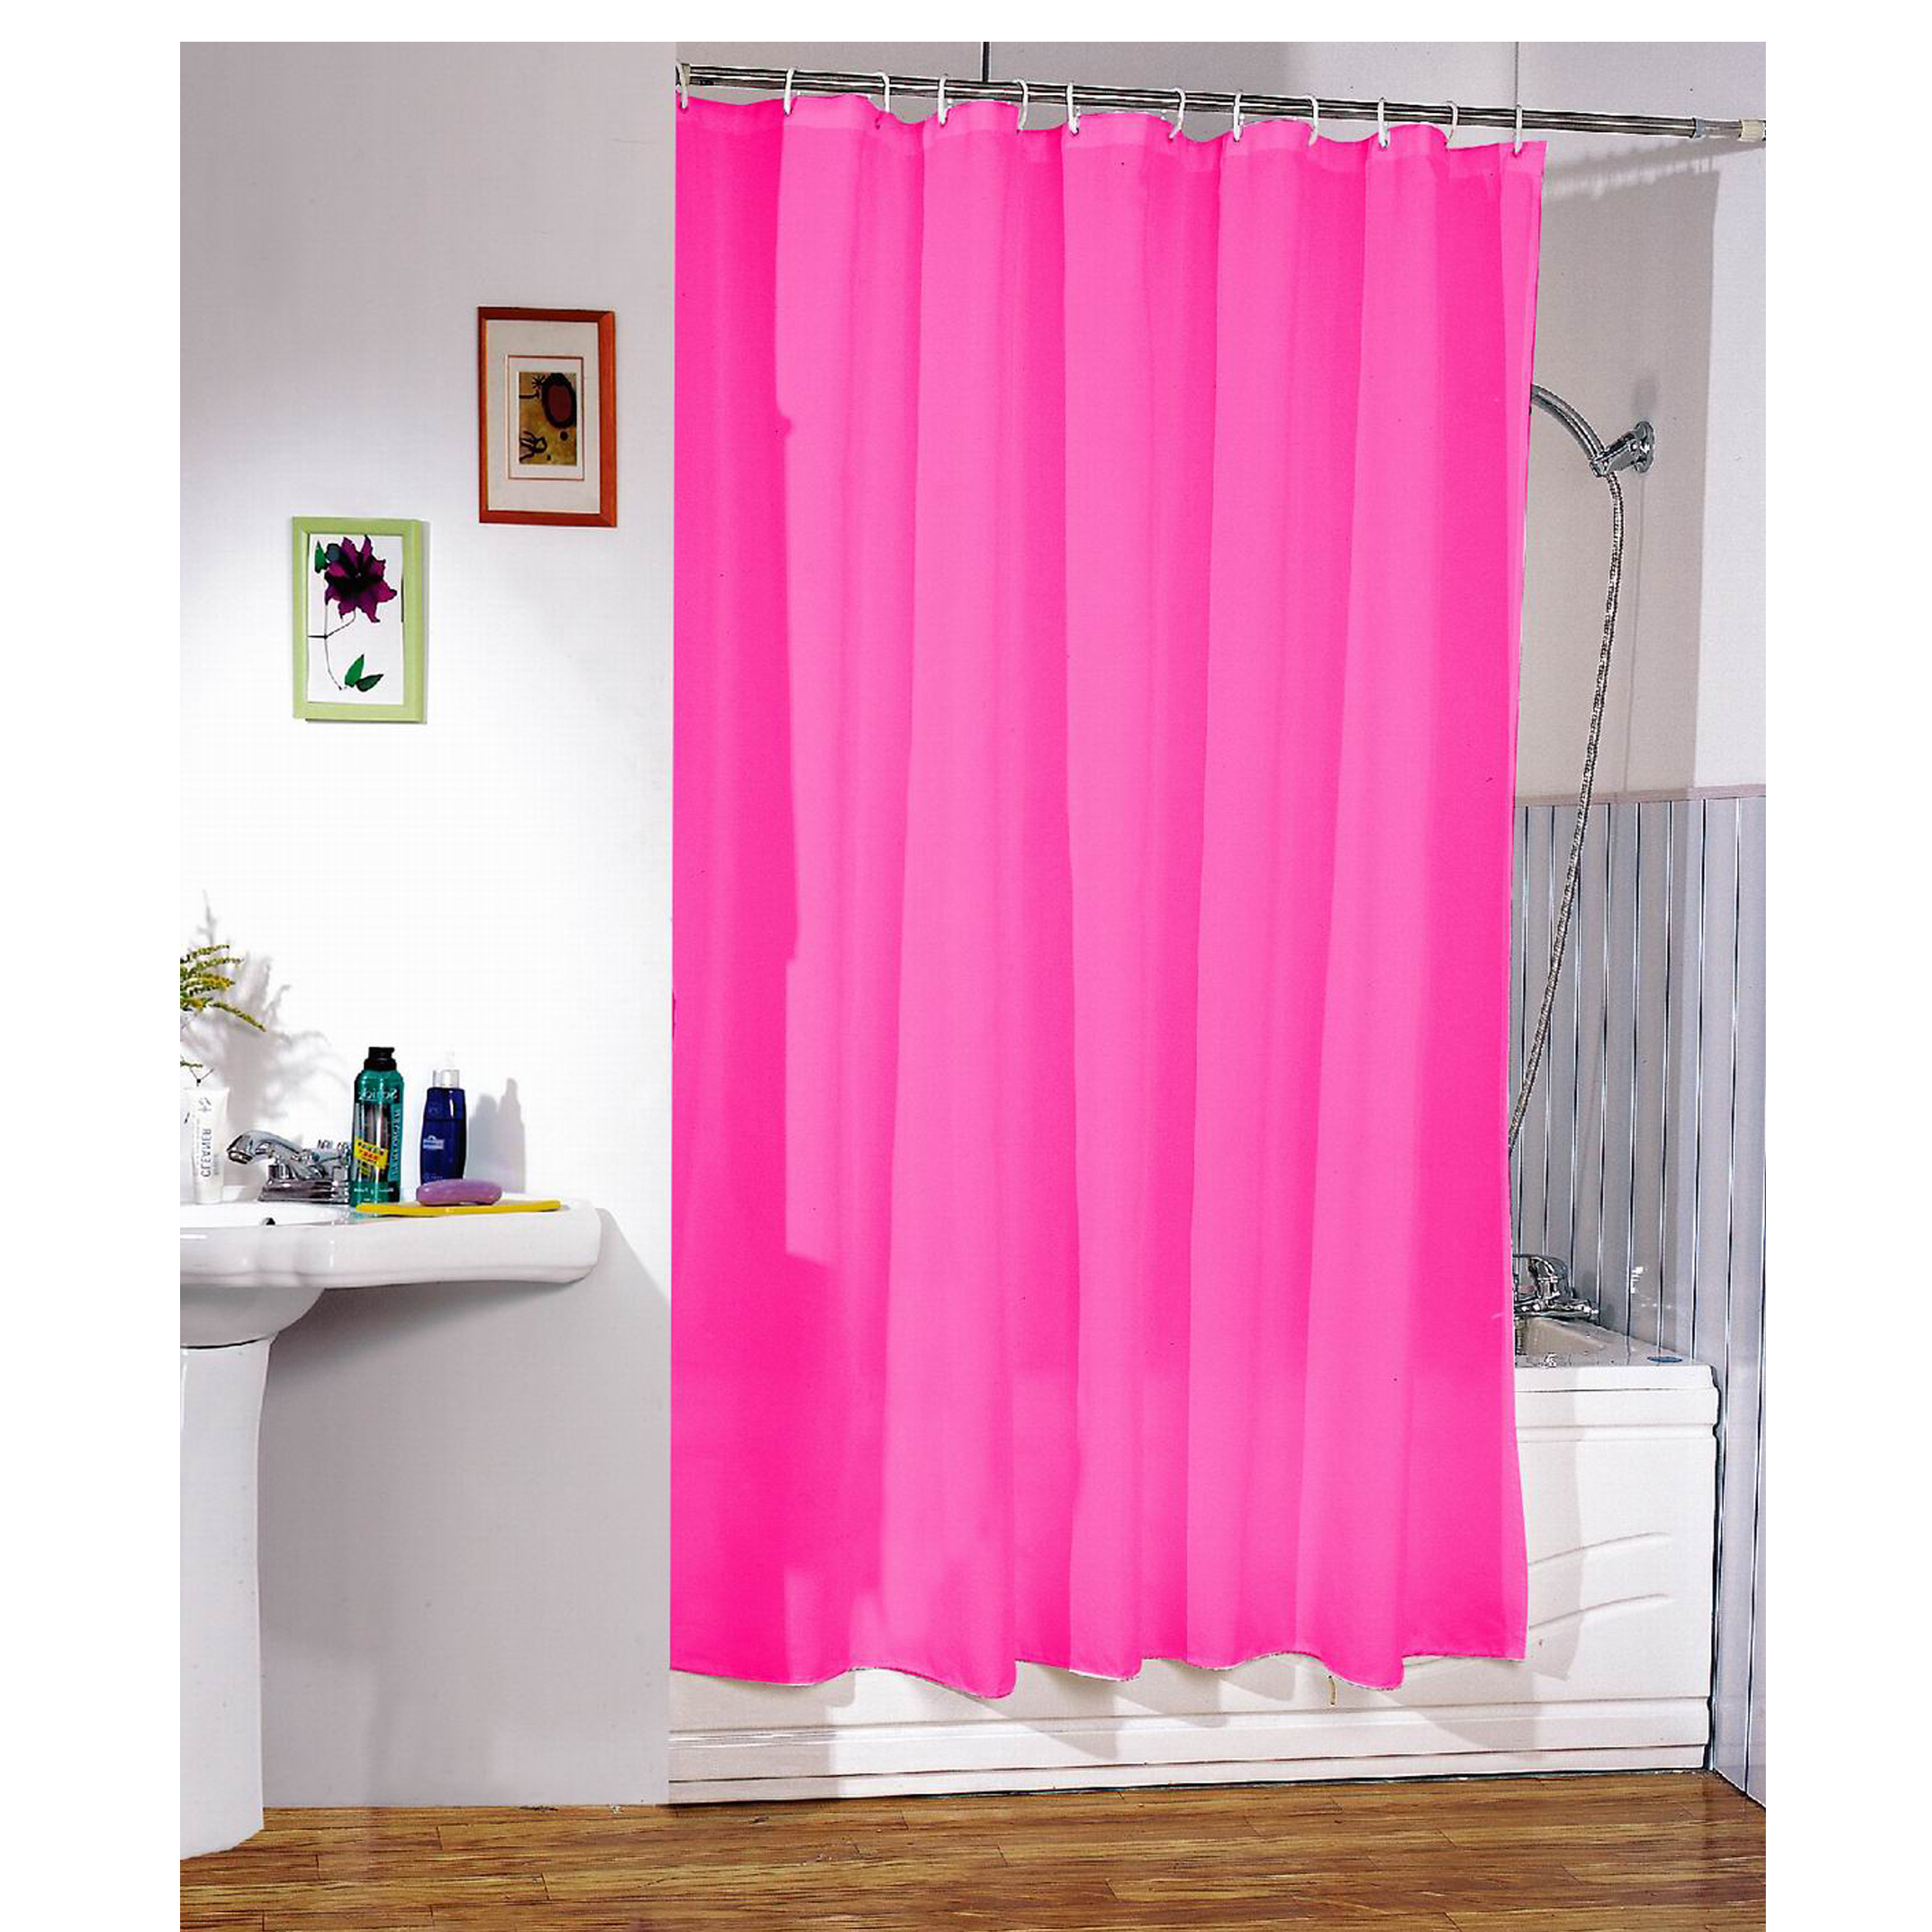 MSV Duschvorhang 180x200cm Anti Schimmel Textil Badewannenvorhang Wannenvorhang Pink